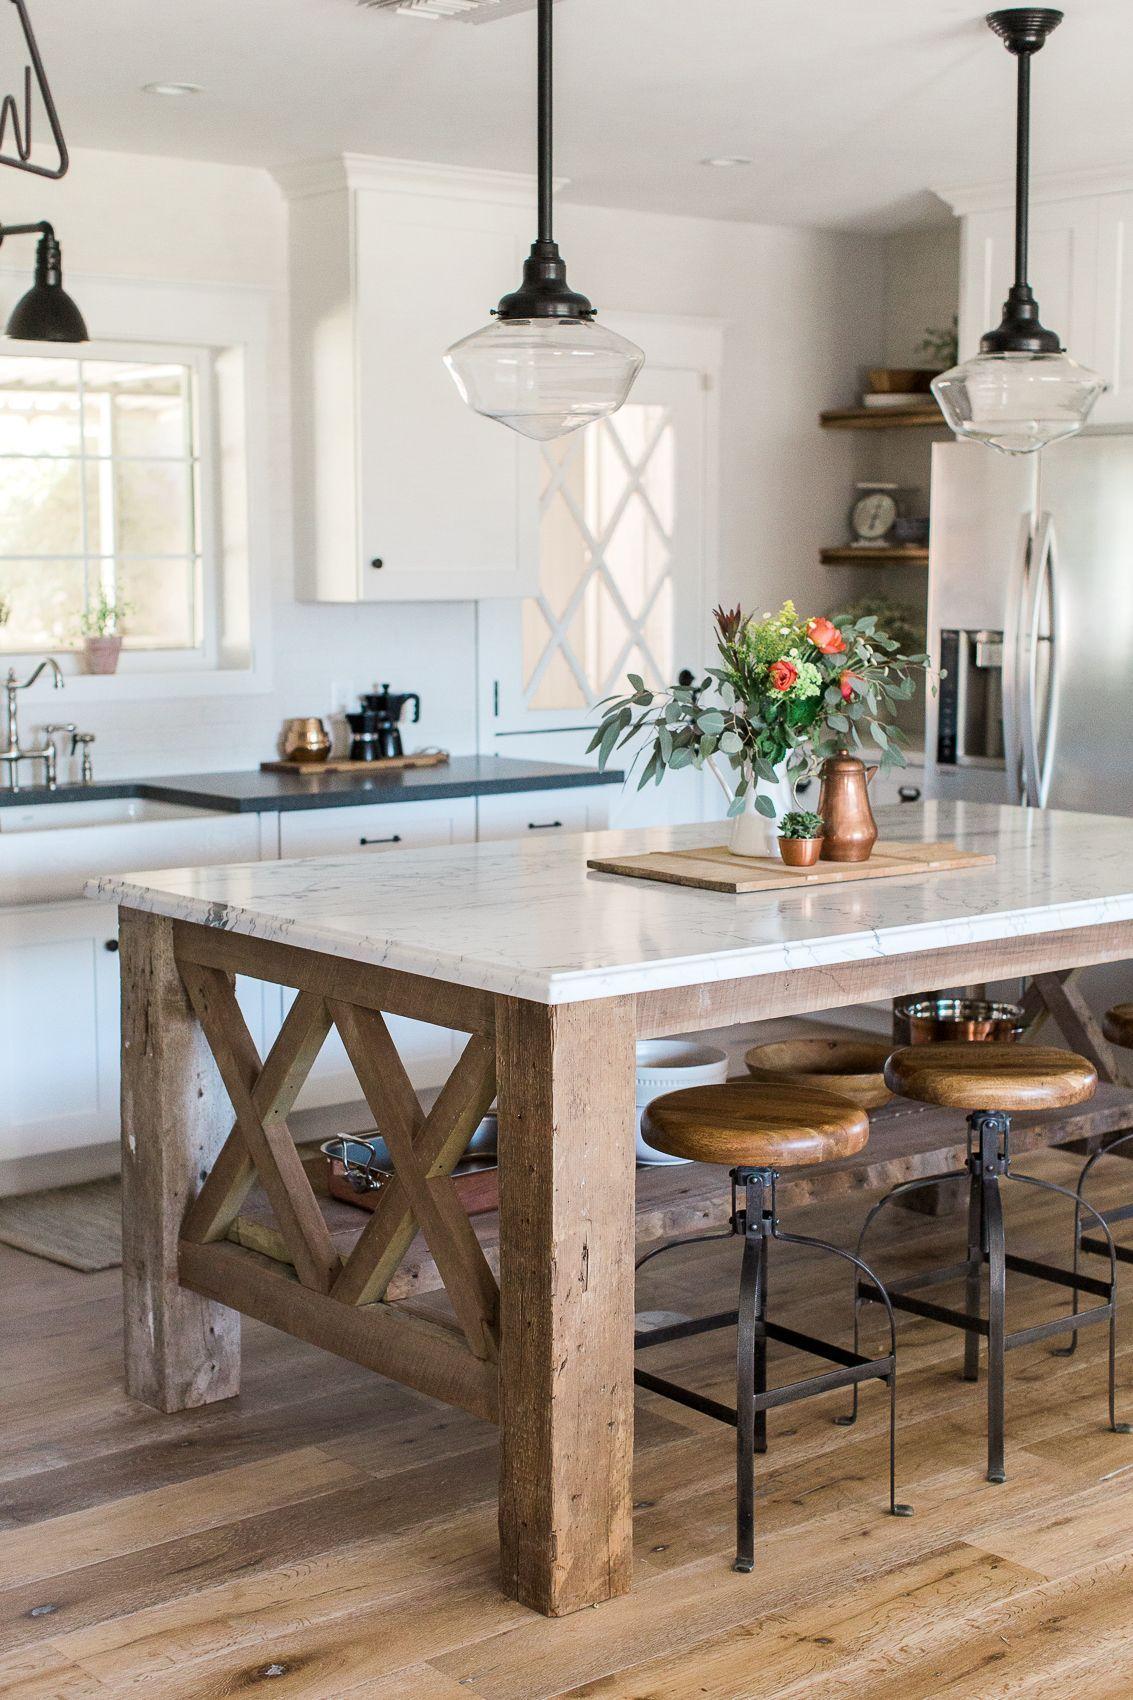 19 unique kitchen island ideas for every space and budget rustic kitchen island kitchen on kitchen ideas unique id=48540